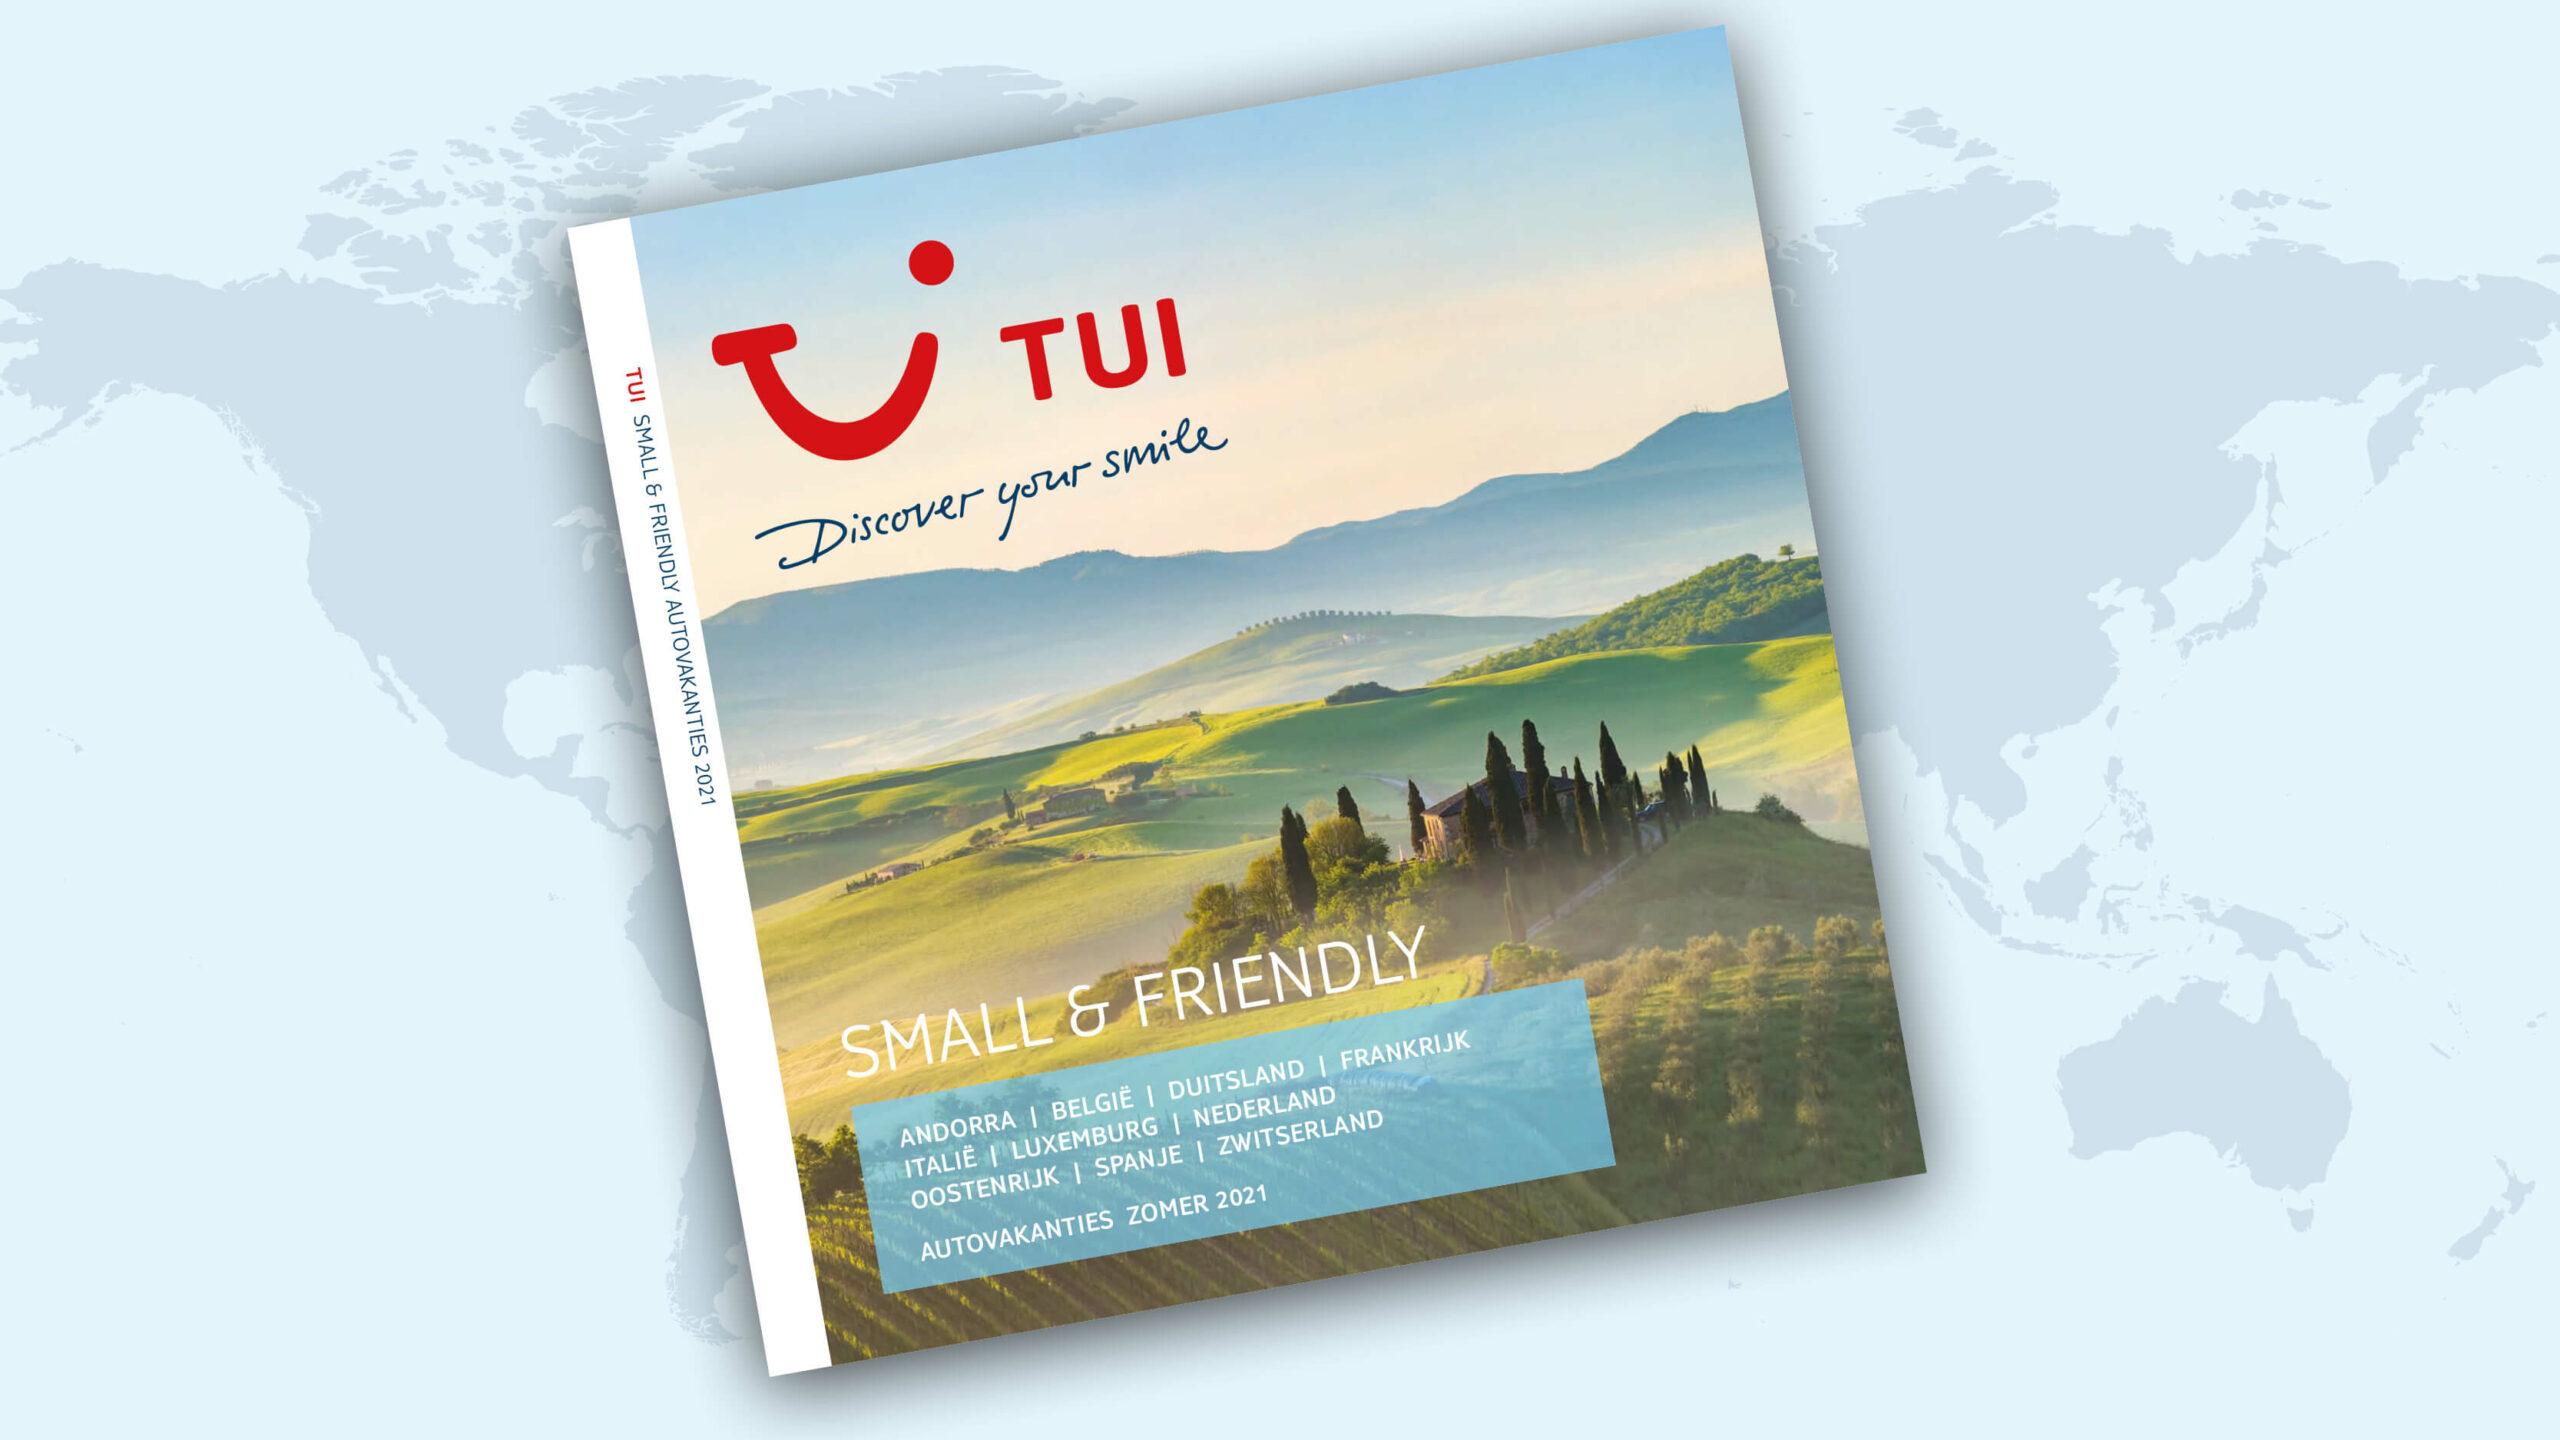 Brochure TUI Small & Friendly 2021 | Mira Tours – Reisbureau Haacht